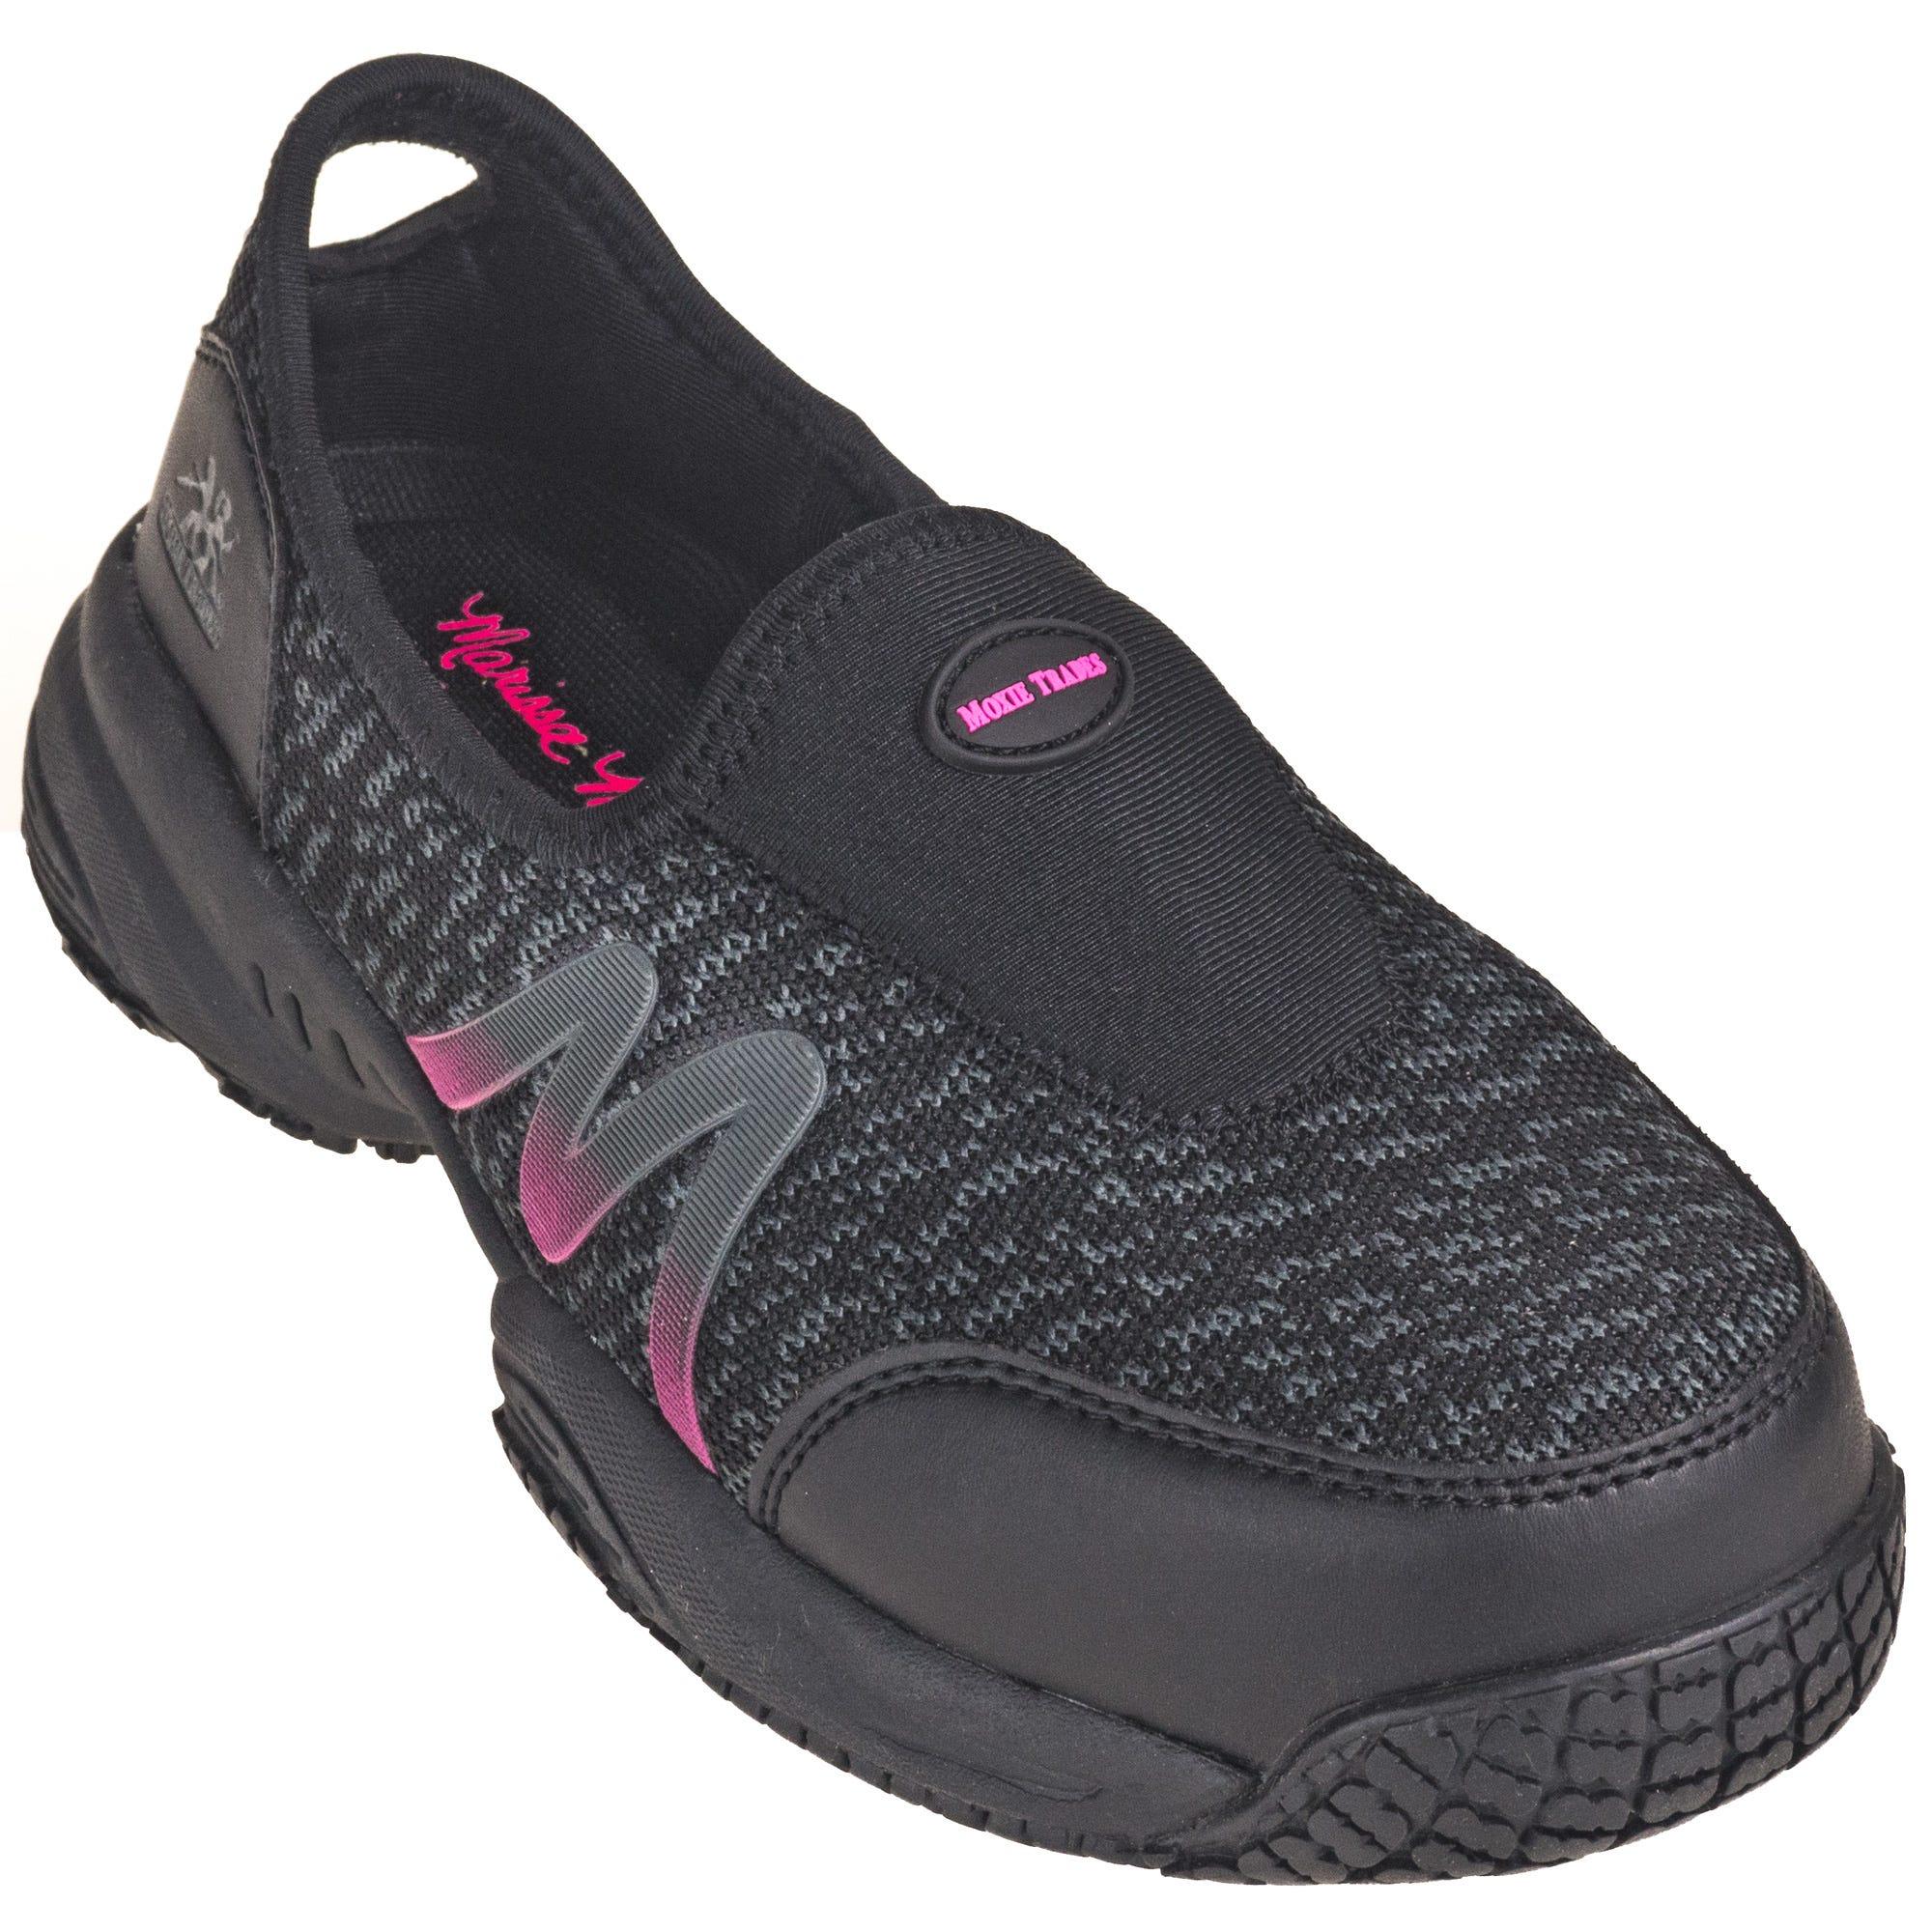 29c51ea7d7b Moxie Trades Shoes  Women s 50180 Non-Metallic Composite Toe Slip-On ...